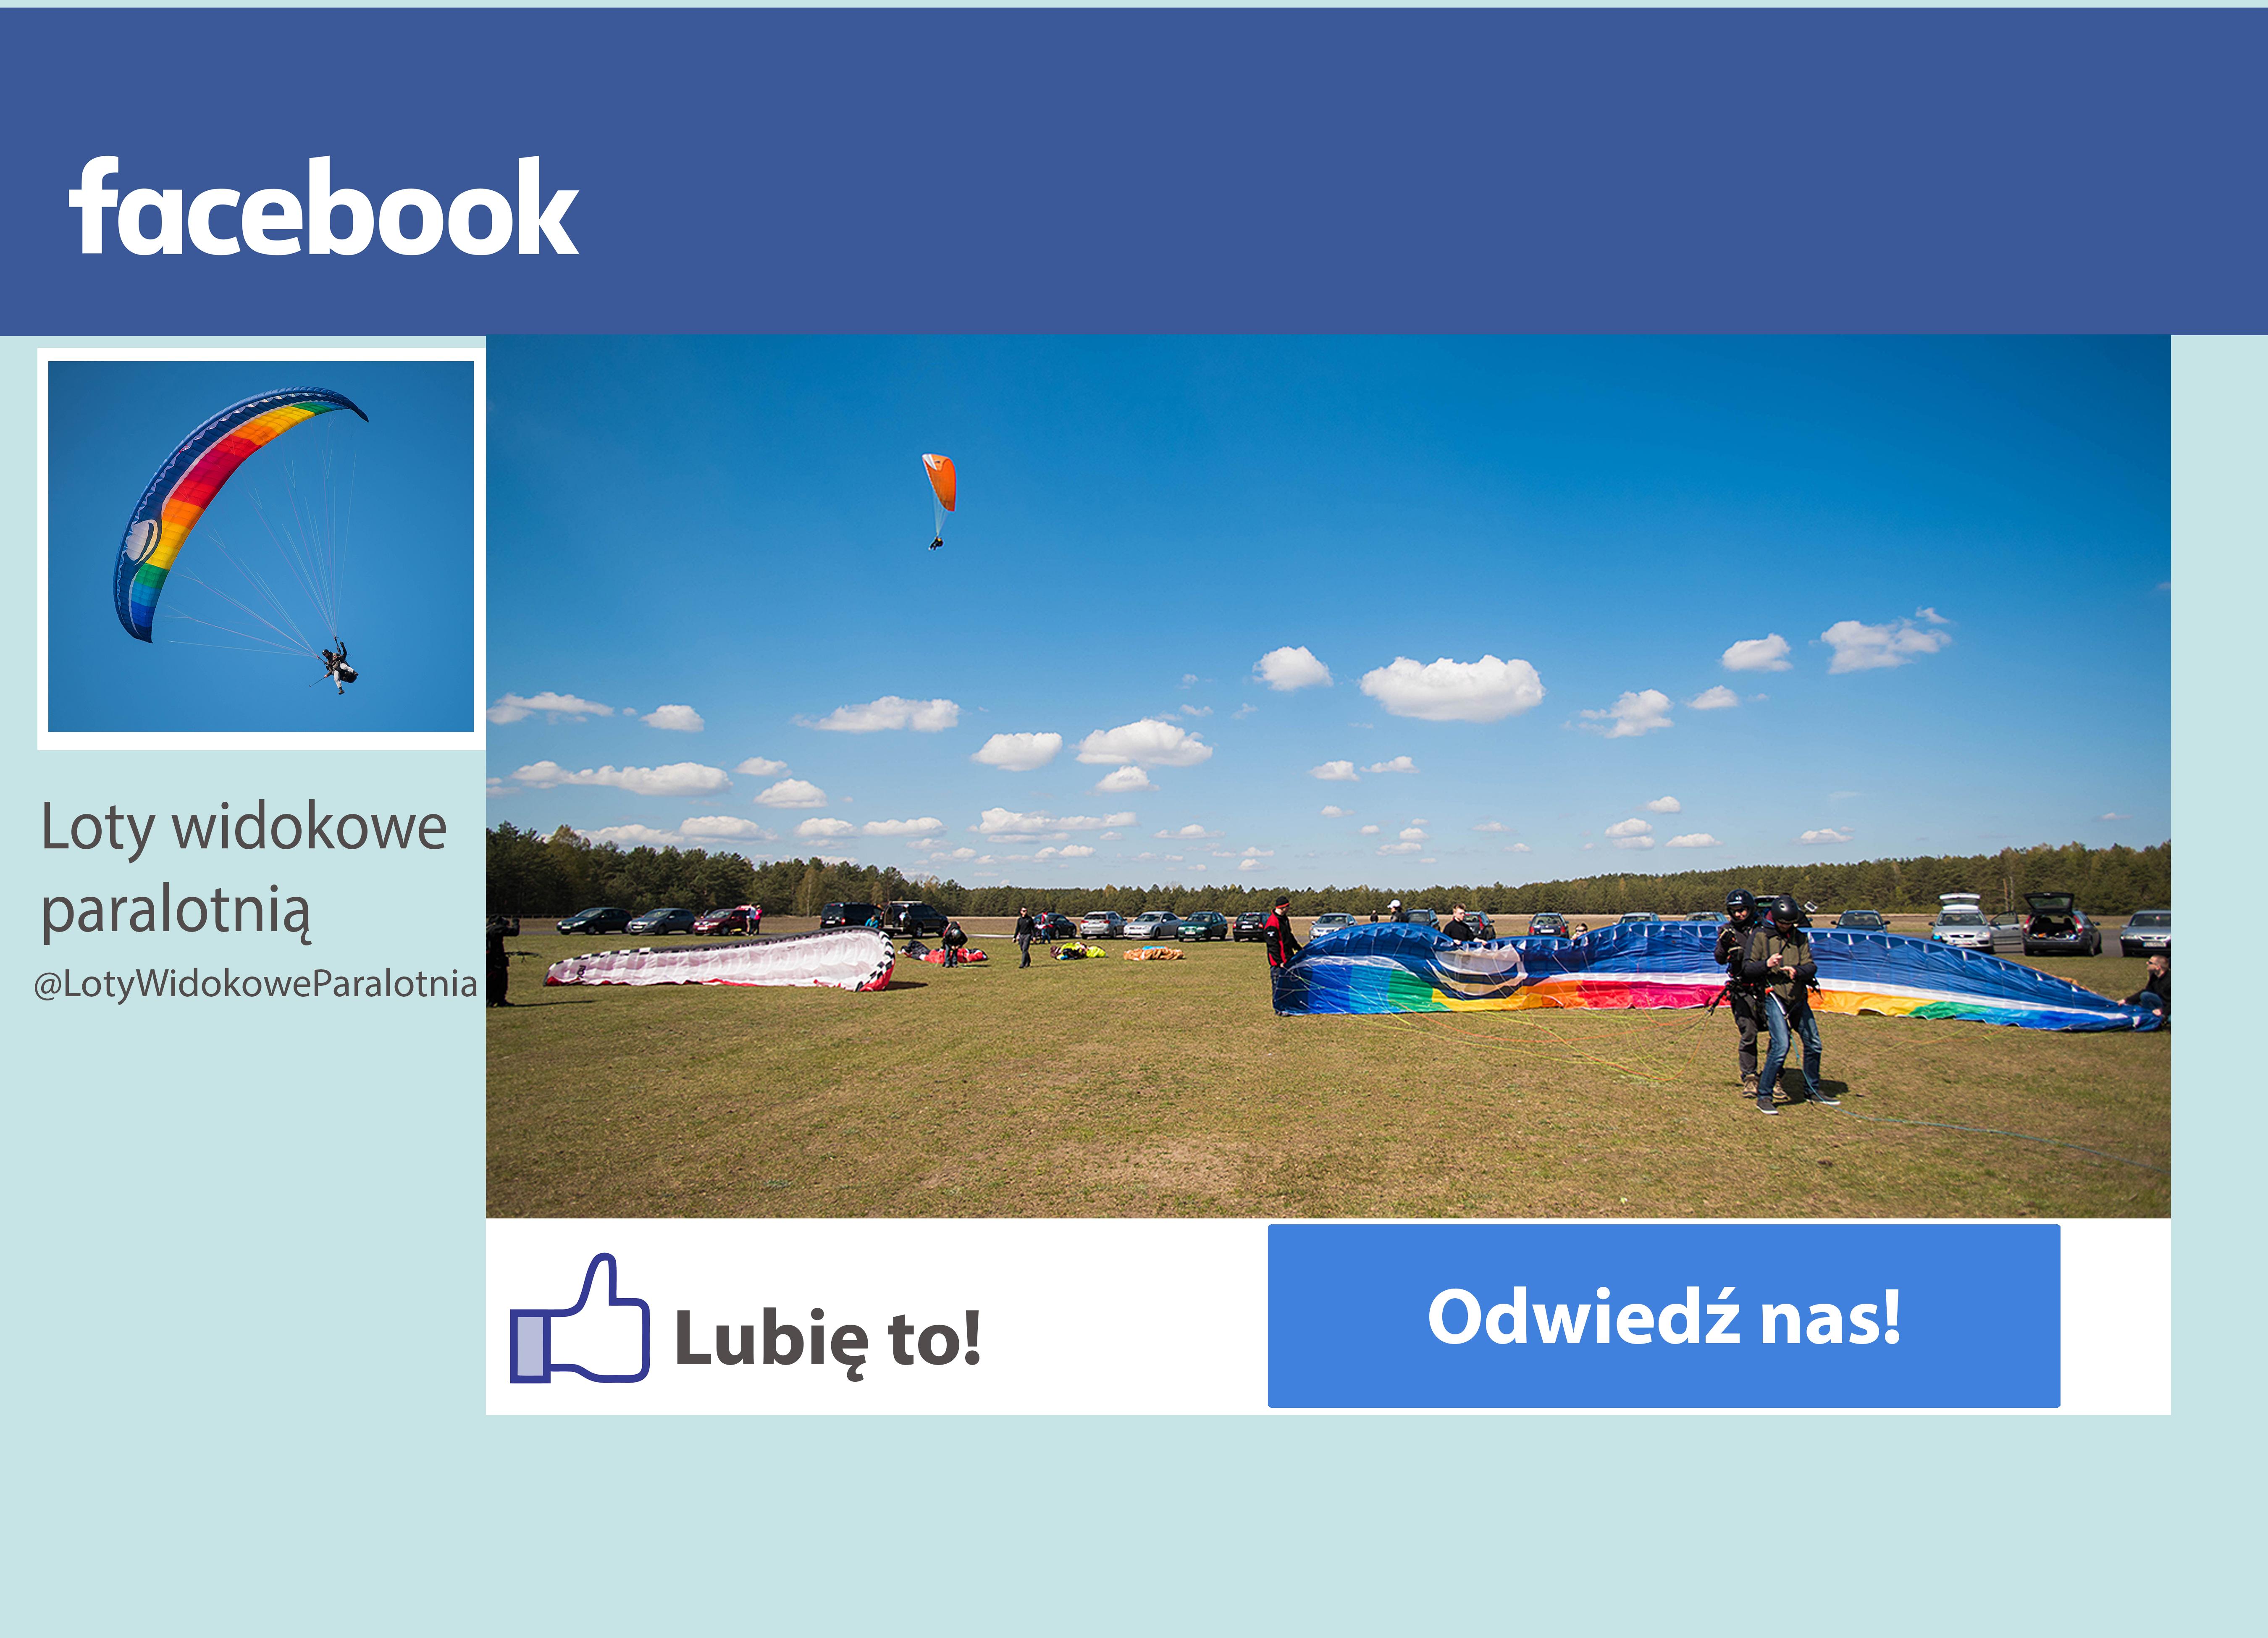 Facebook Loty Widokowe Paralotnią